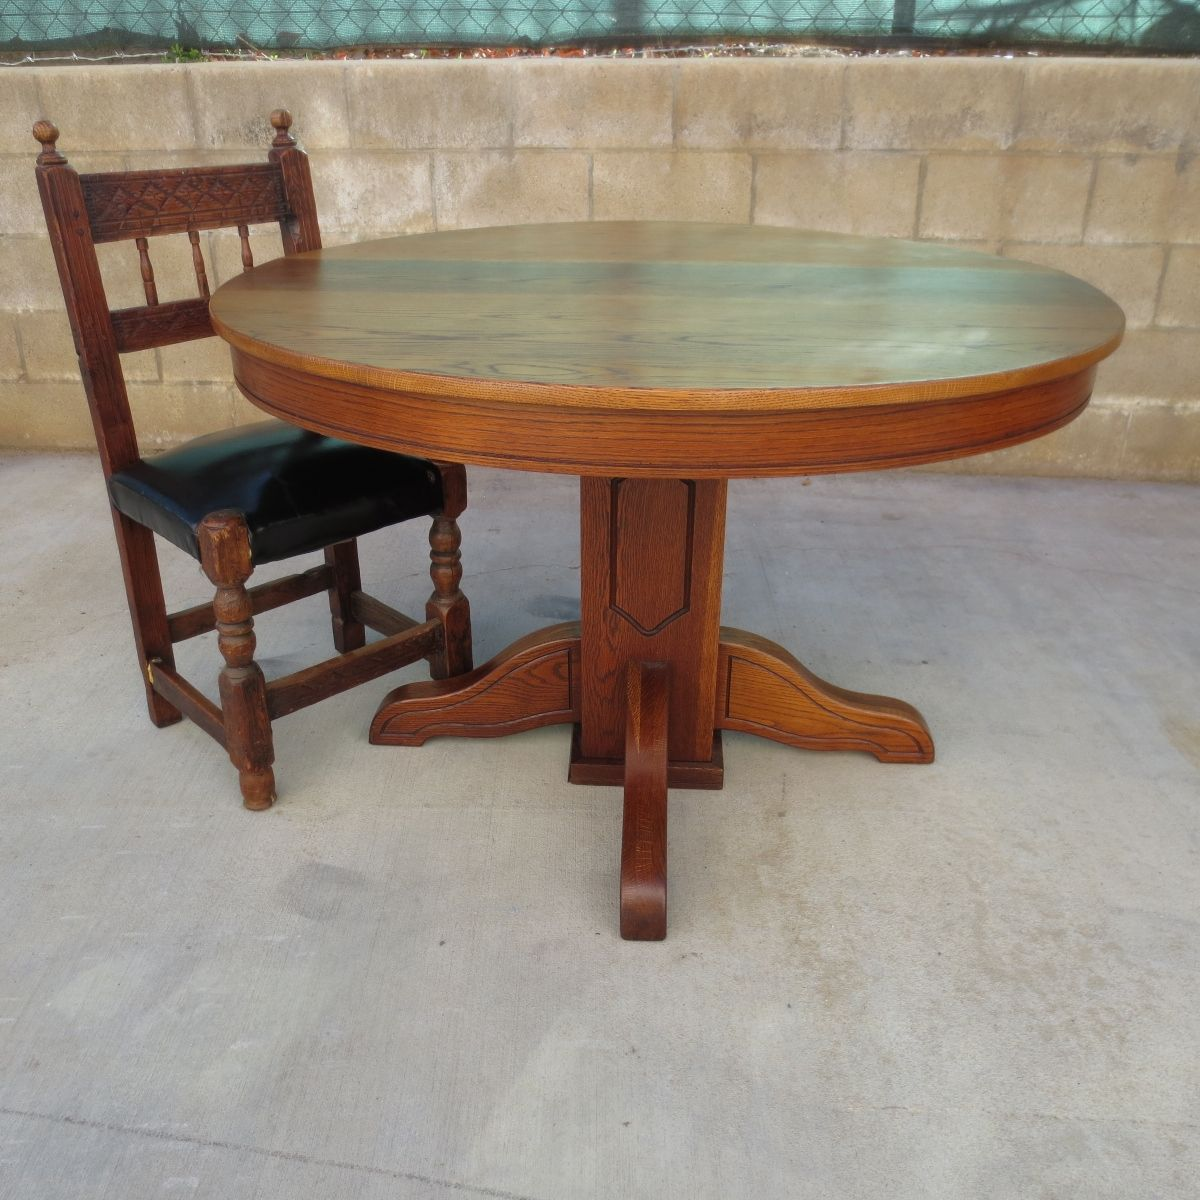 antique oak round kitchen table antique oak round kitchen table   http   manageditservicesatlanta      rh   pinterest com